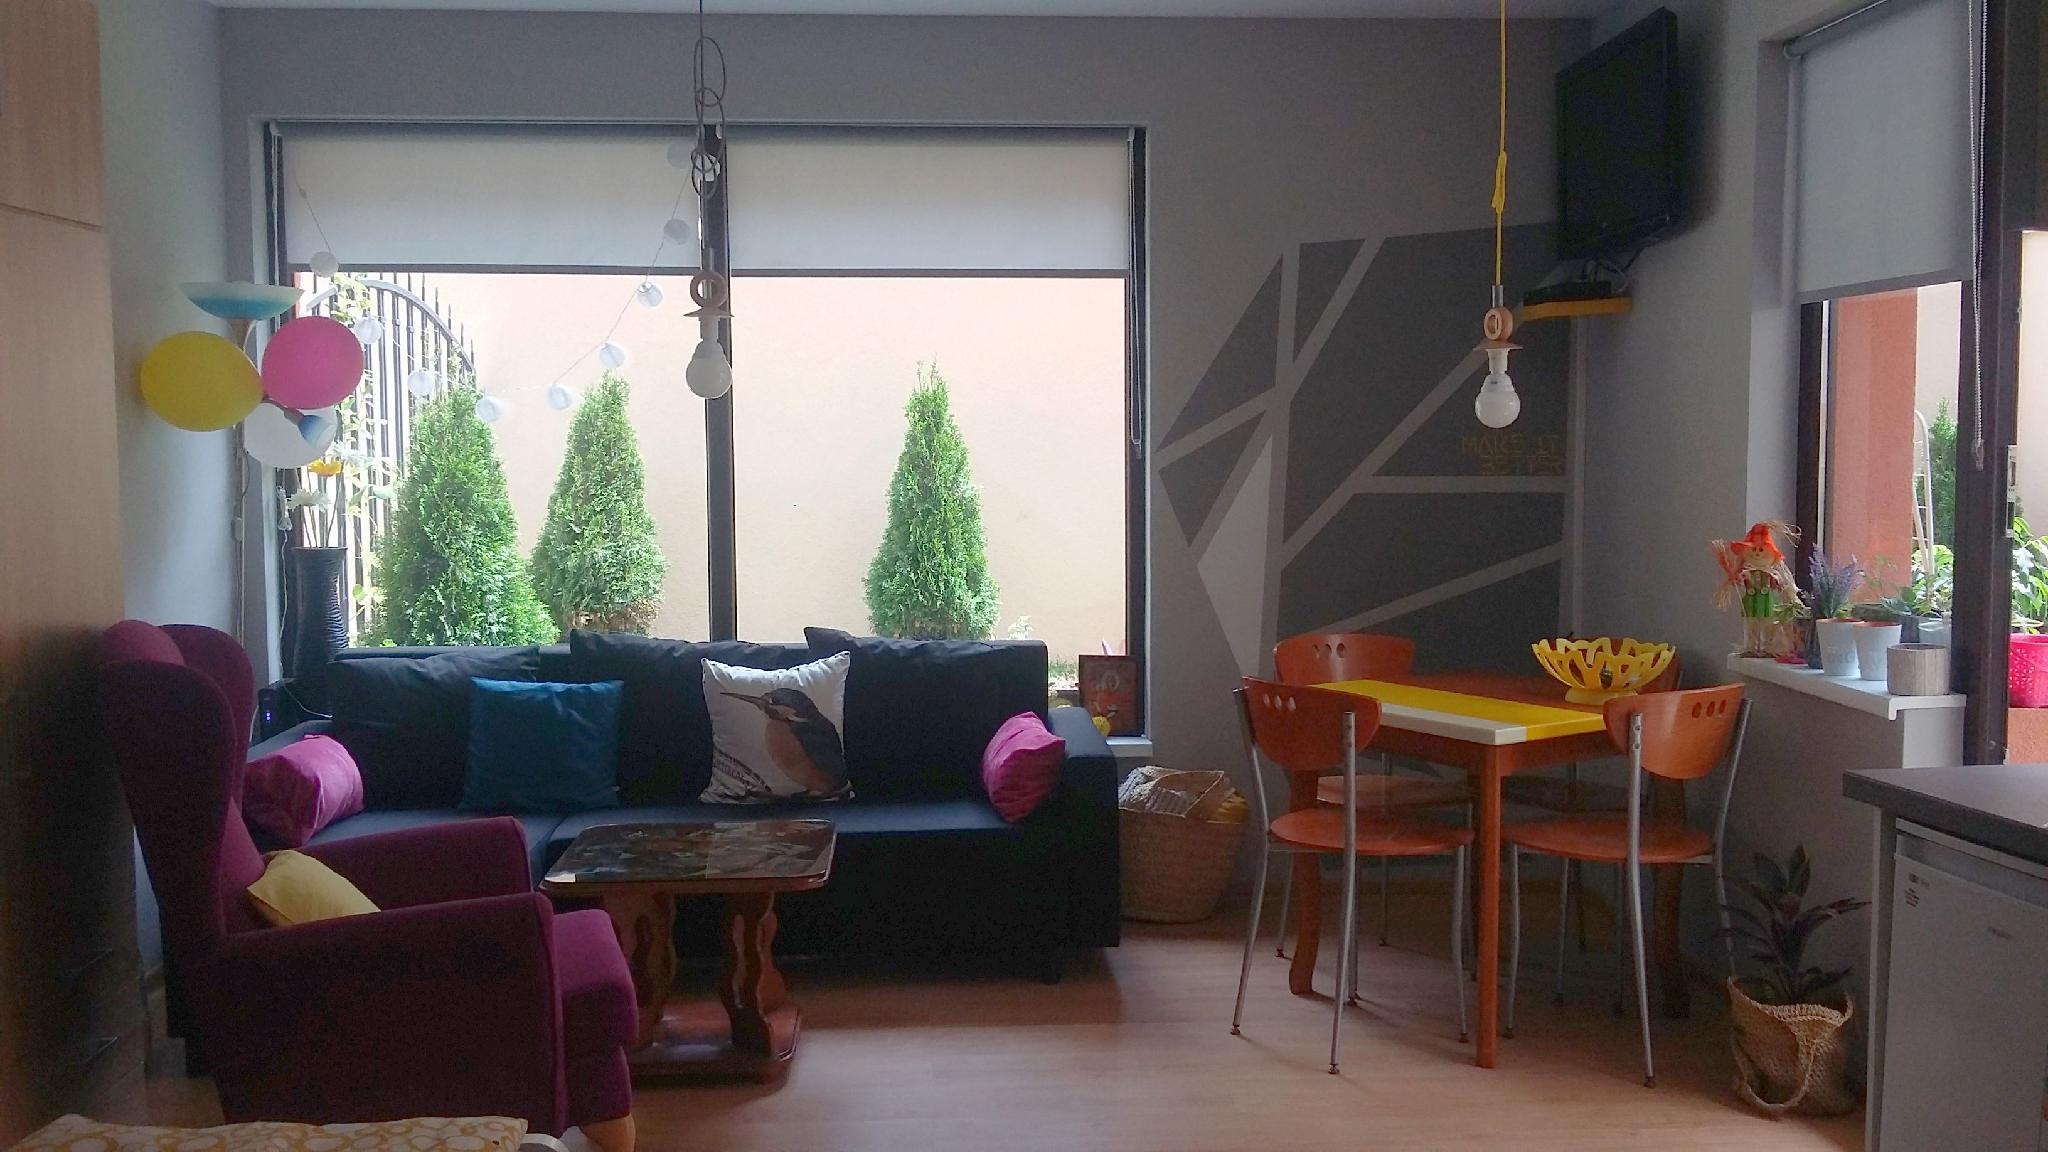 Dreamcatcher's Home